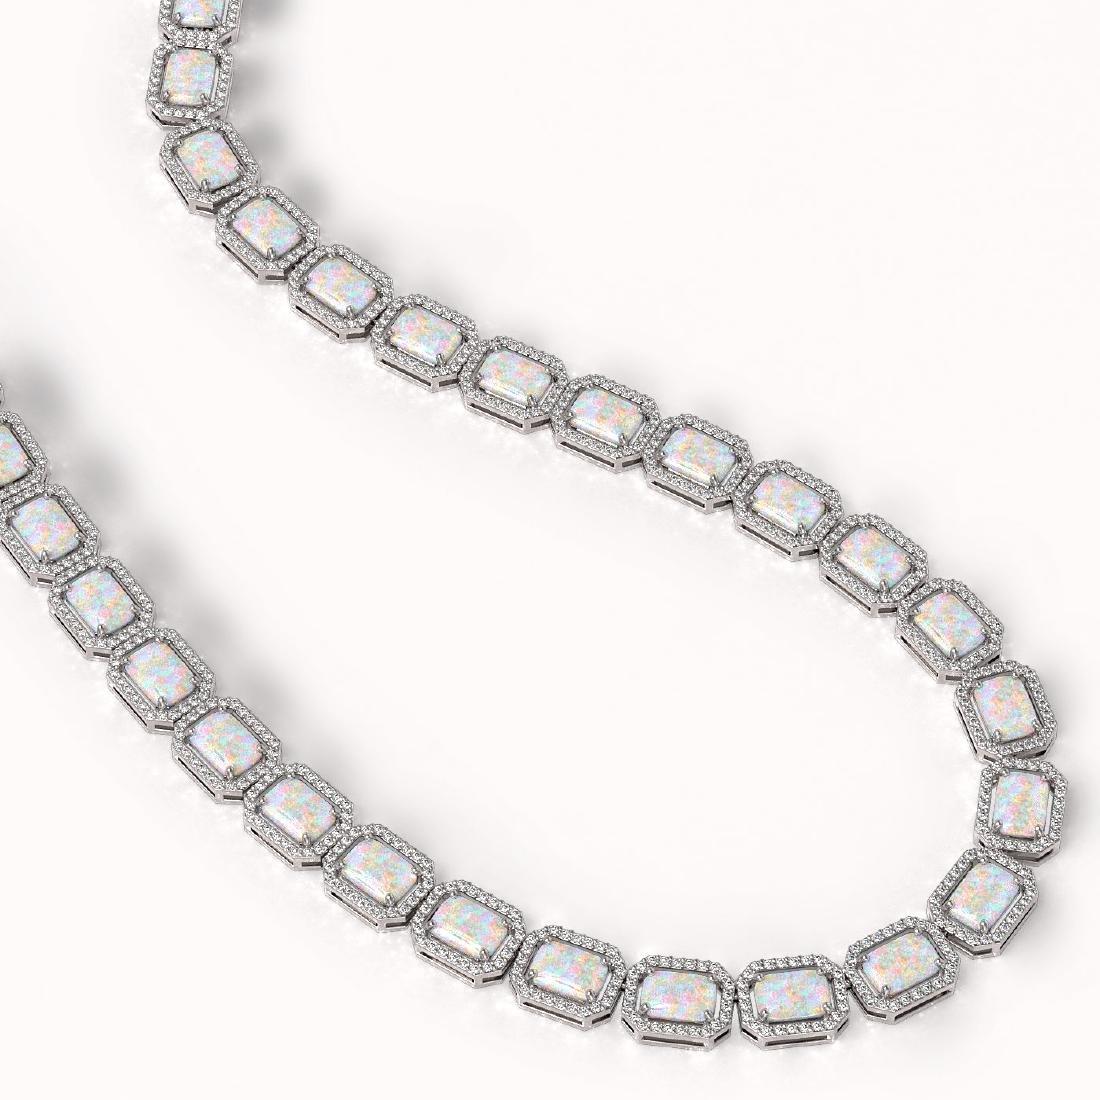 37.69 CTW Opal & Diamond Halo Necklace 10K White Gold - 2